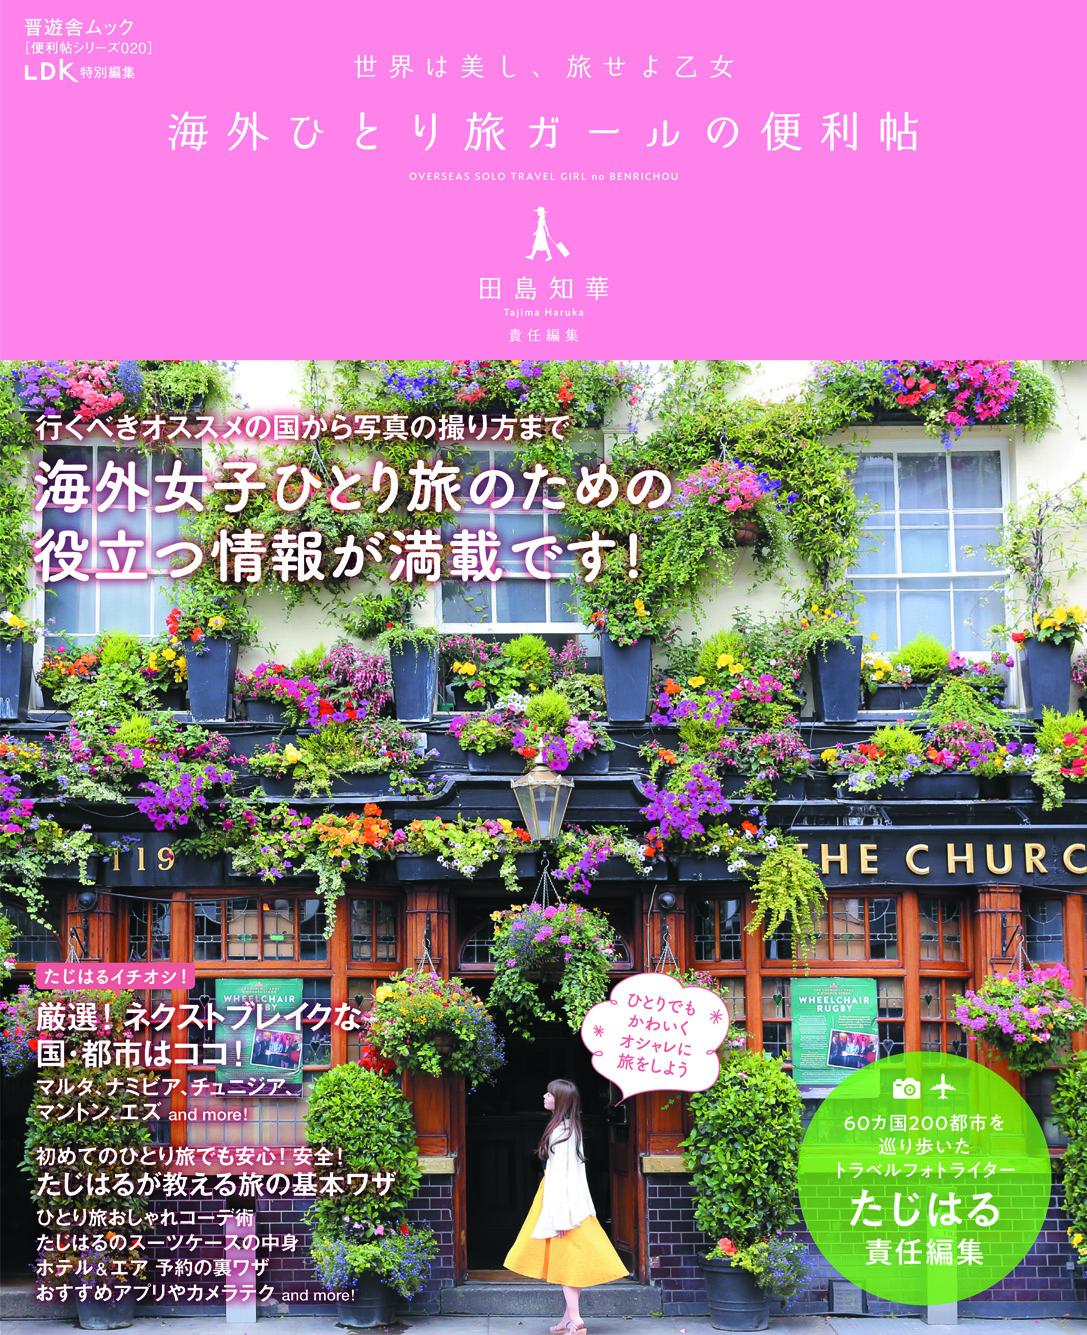 jyoshitabi_h1-4_dic25.indd